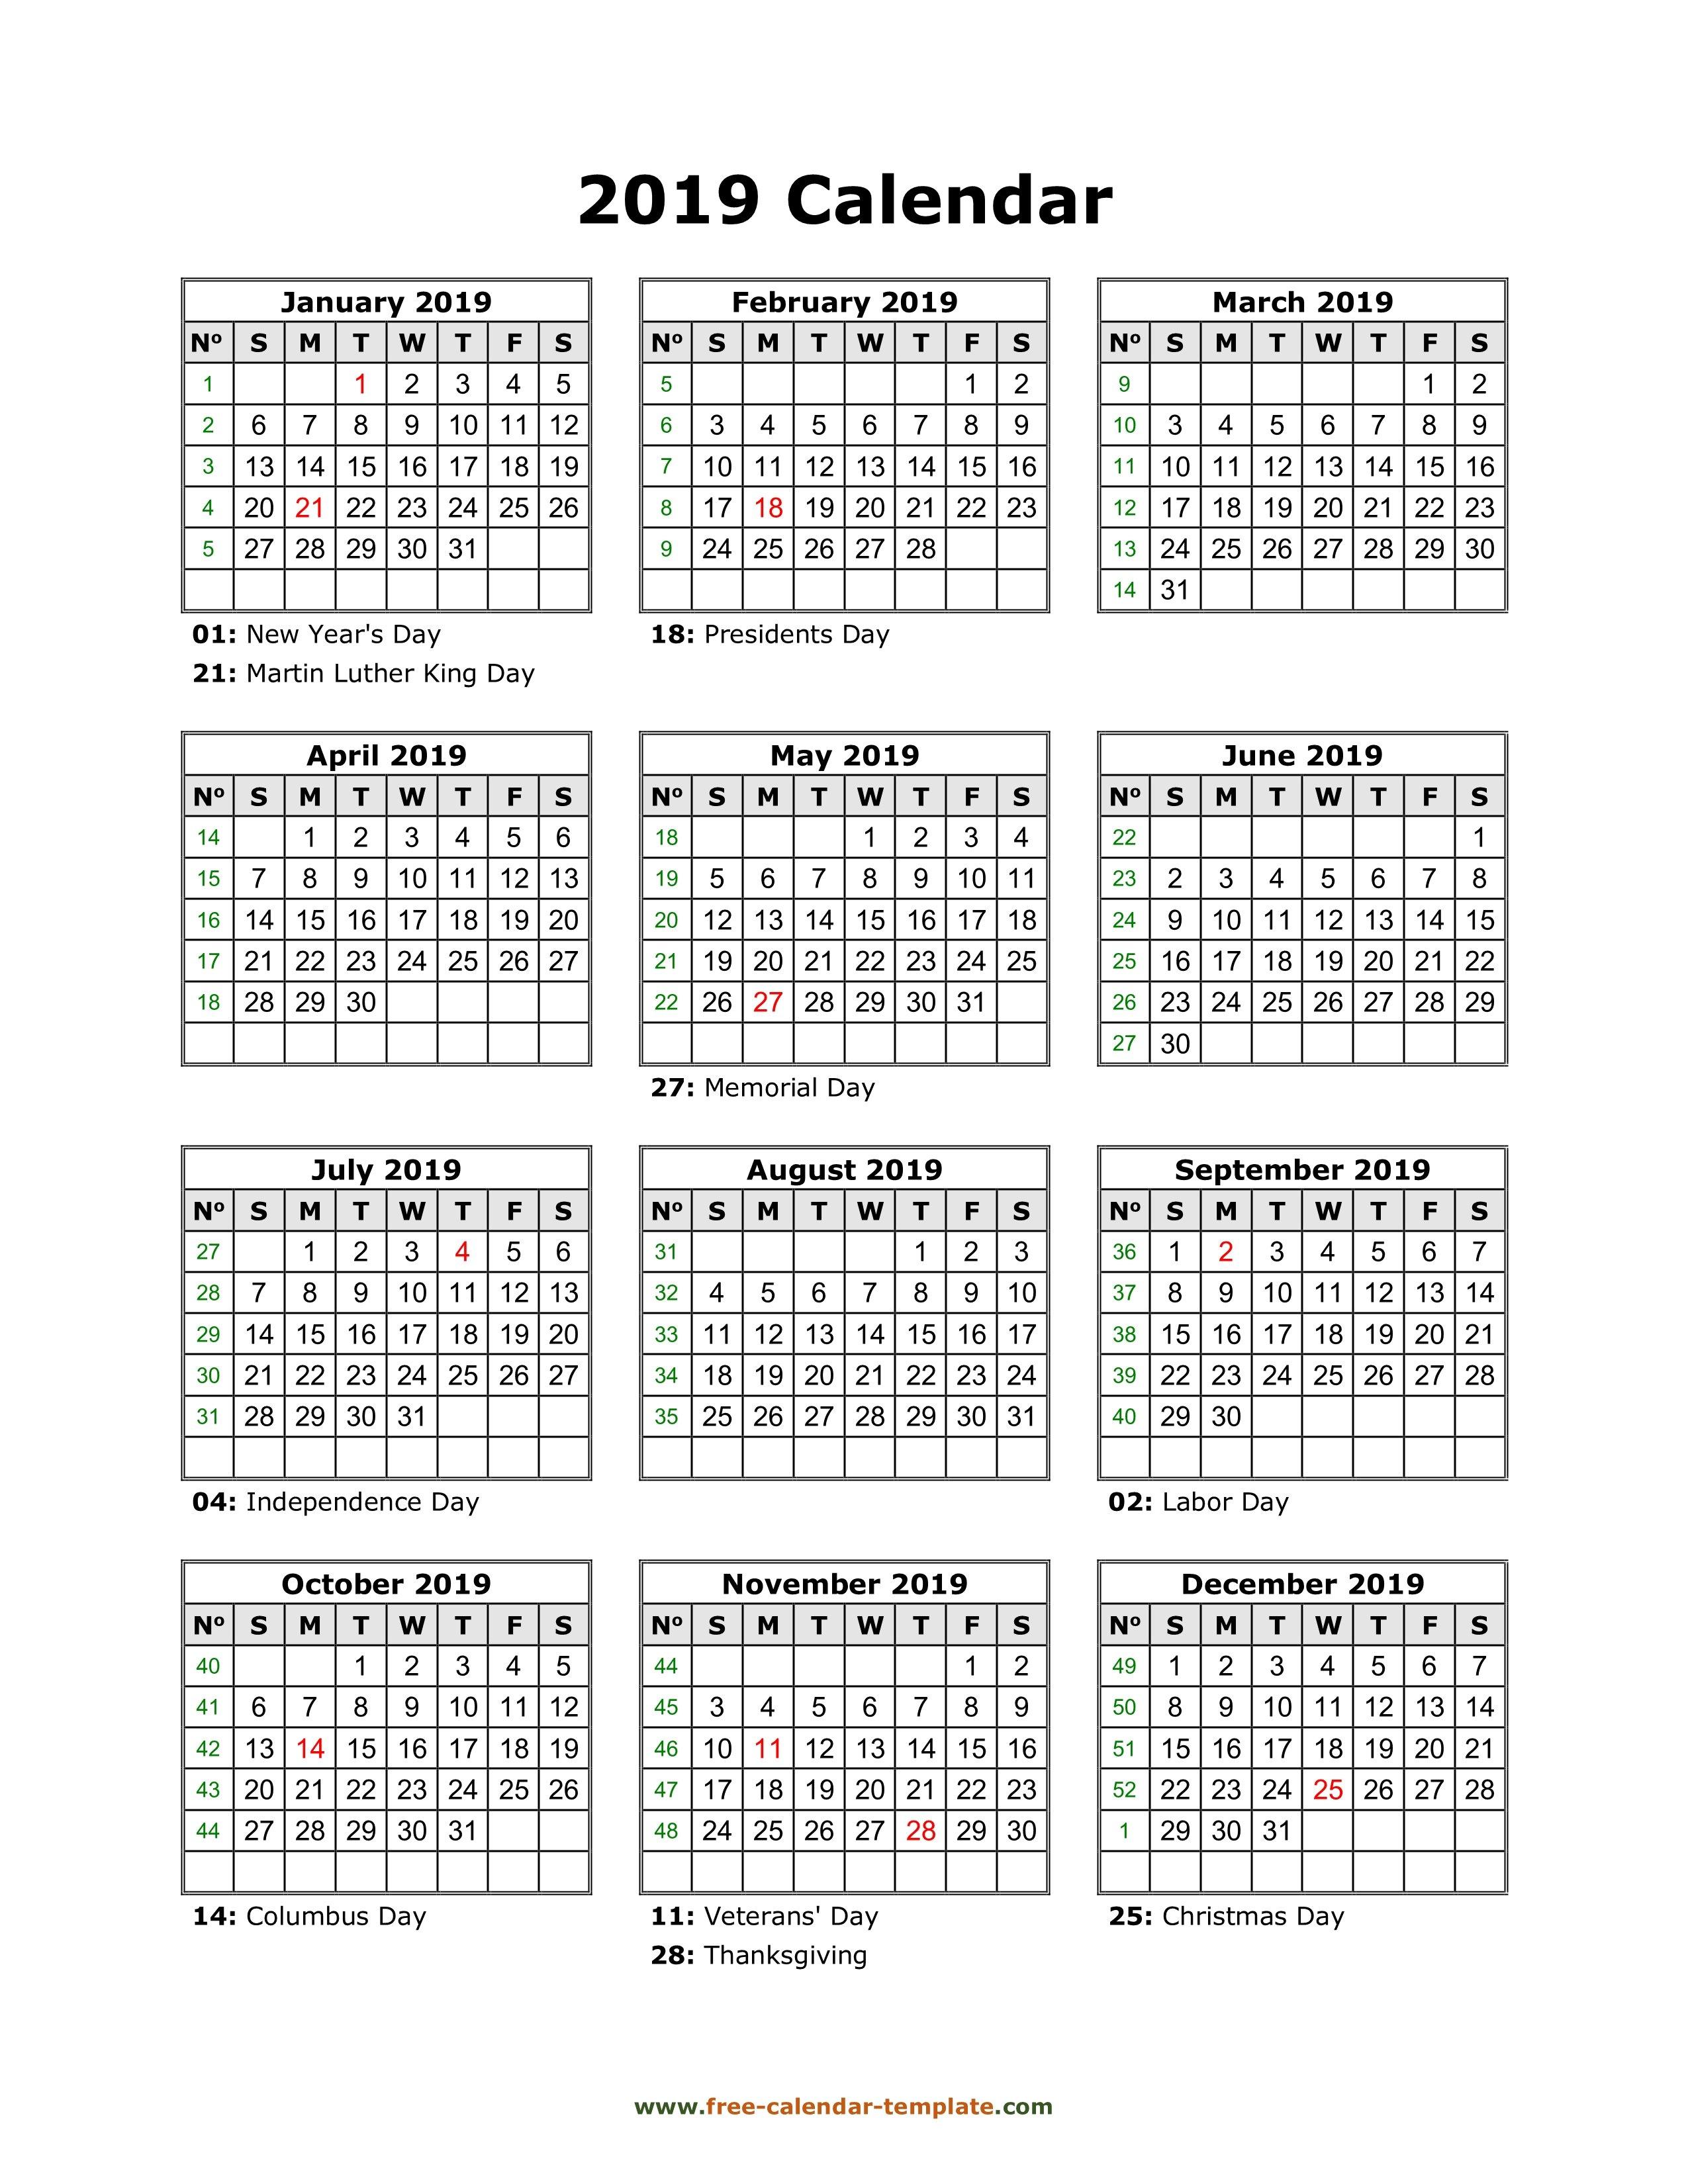 Yearly Printable Calendar 2019 With Holidays | Free Calendar Calendar 2019 View